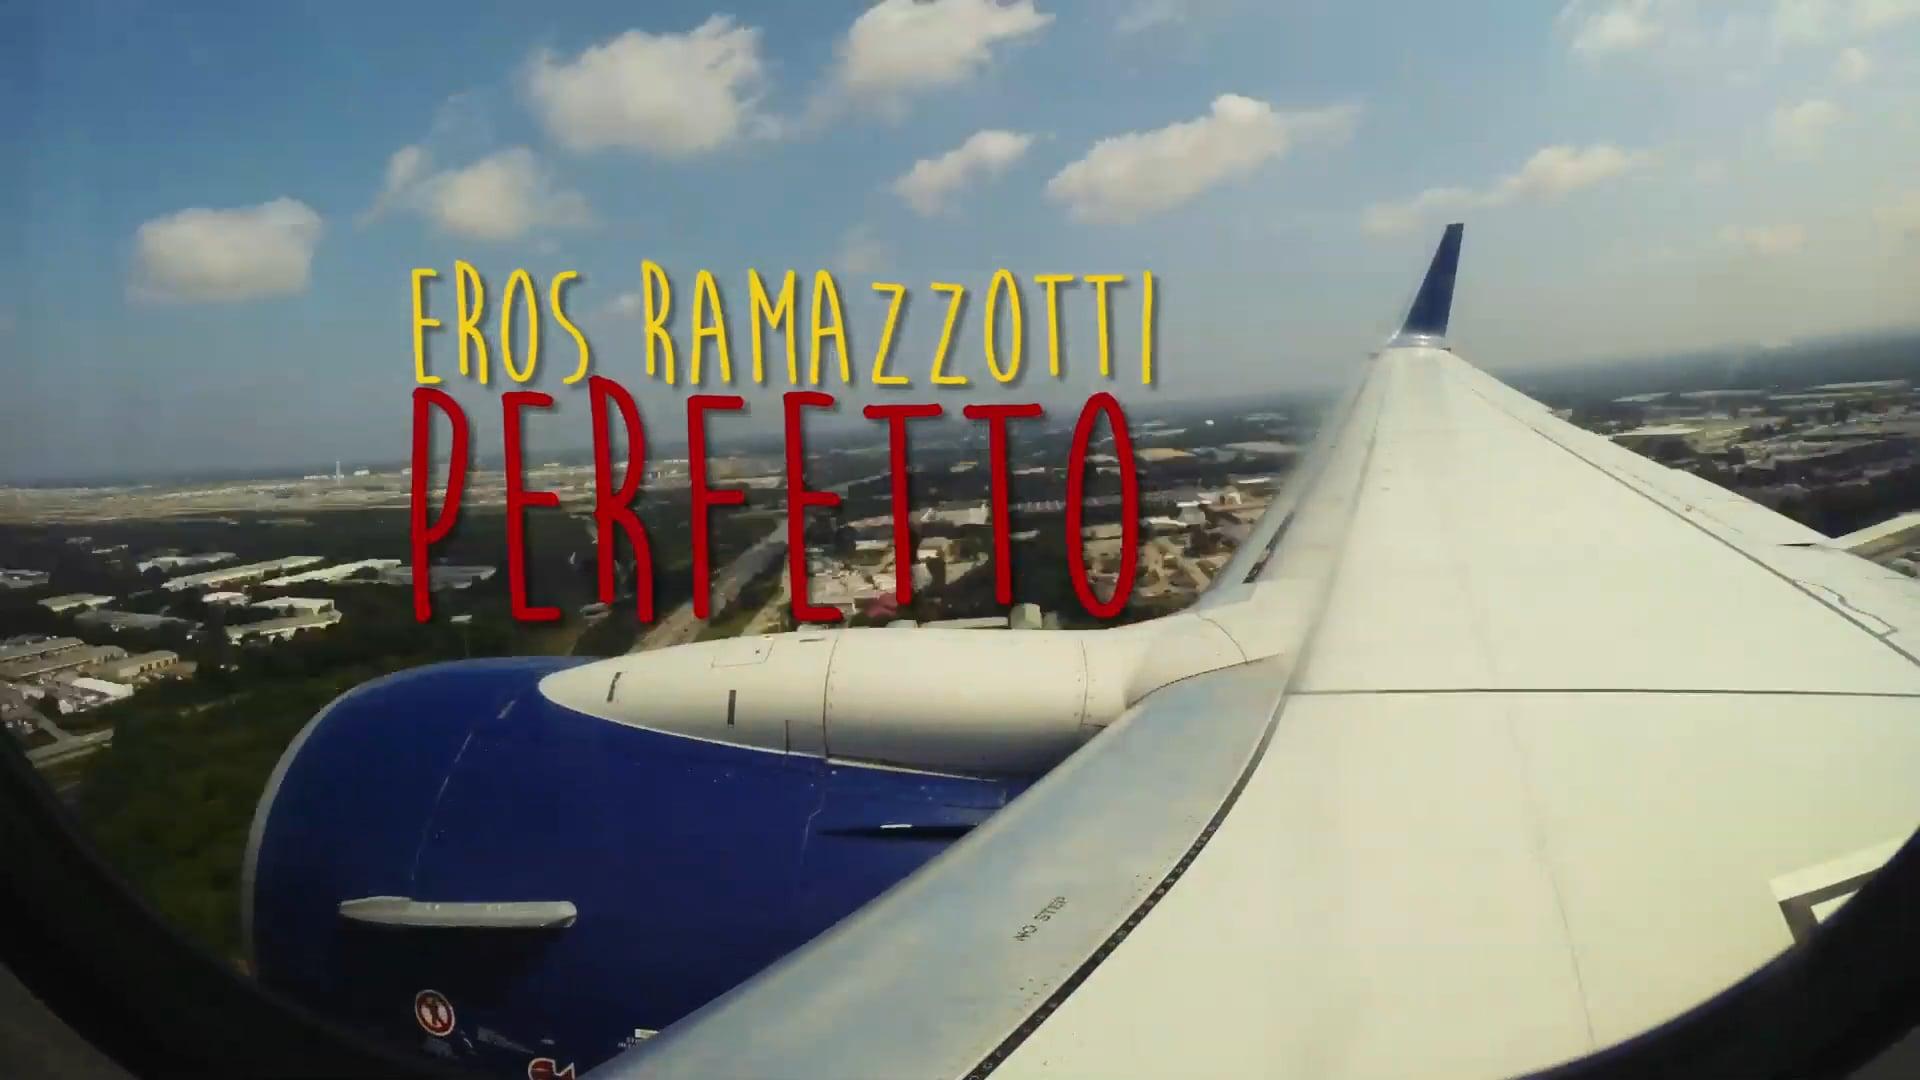 """PERFETTO"" - EROS RAMAZZOTTI DOCUMENTARY"